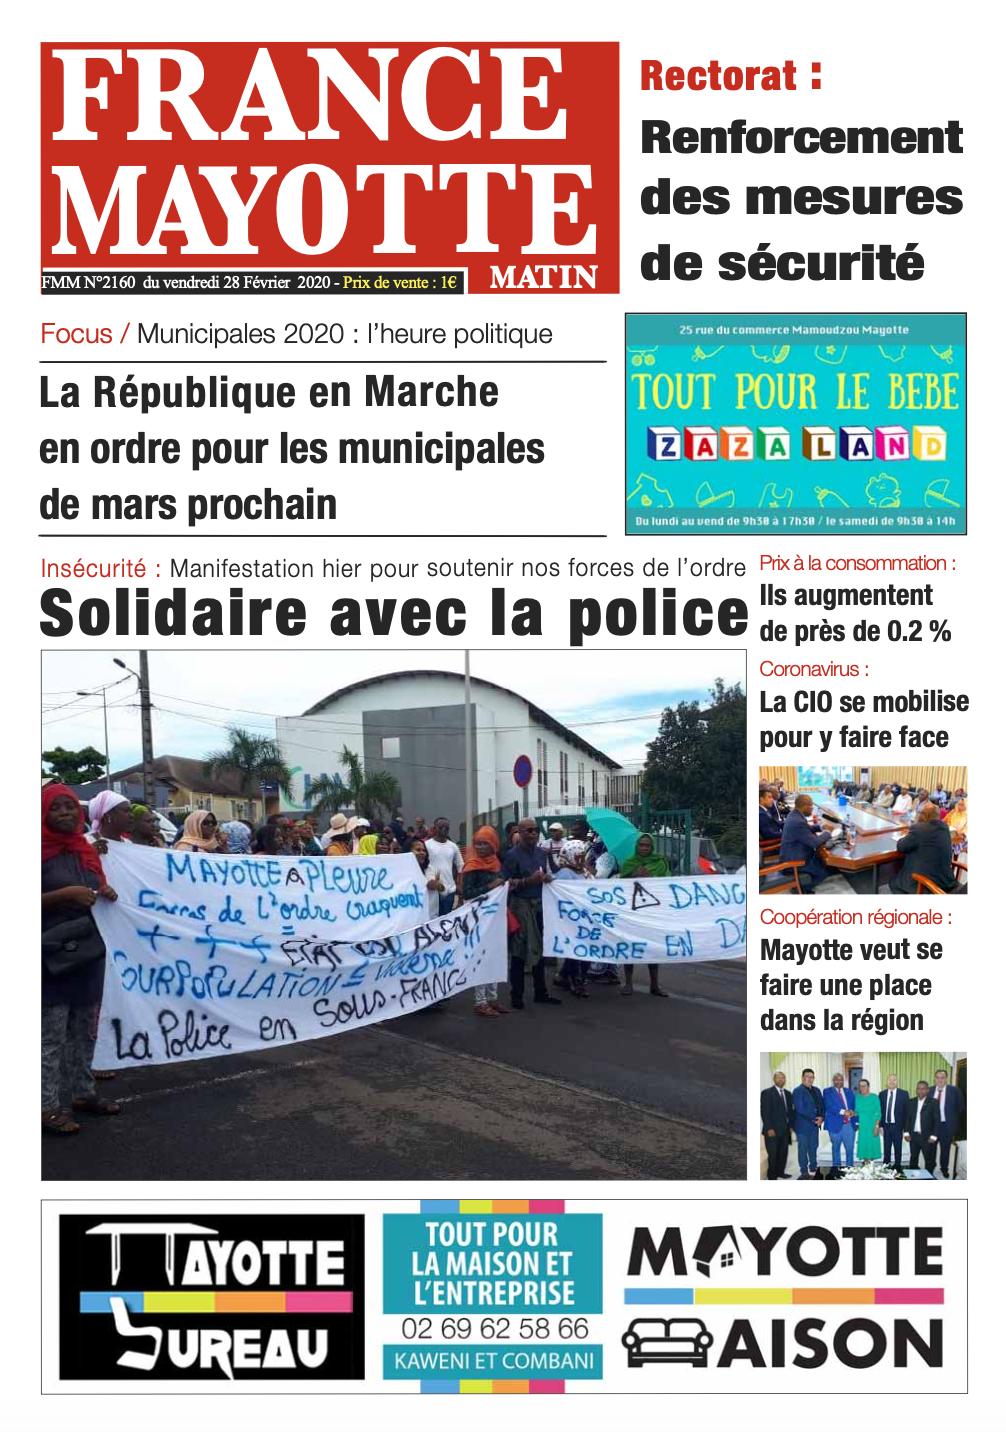 France Mayotte Vendredi 28 février 2020